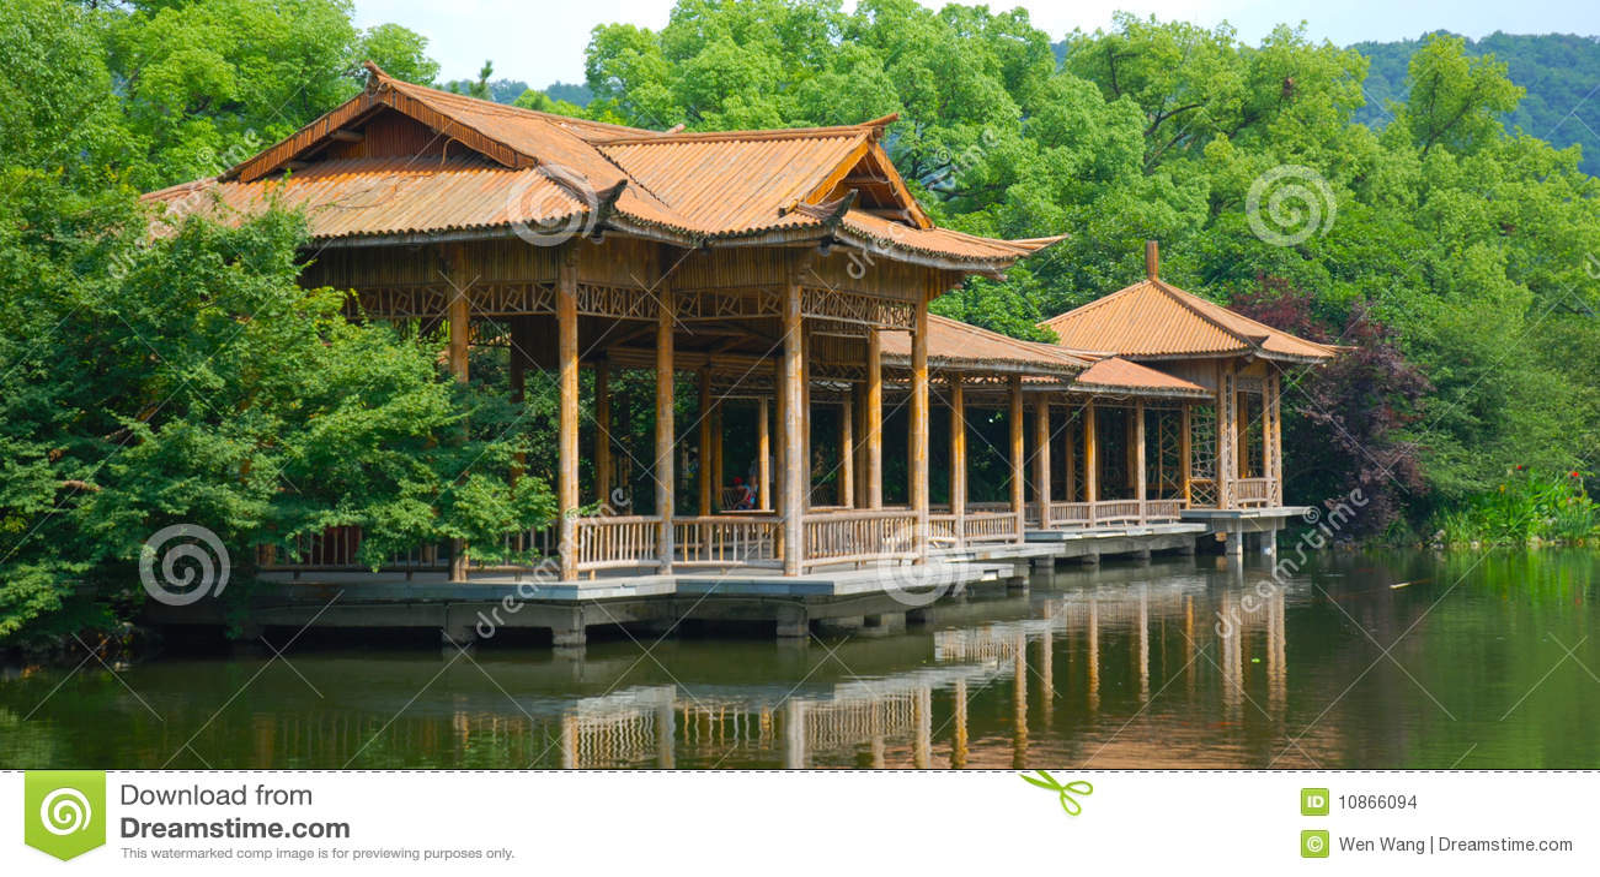 Hangzhou West Lake Scenery Stock Images